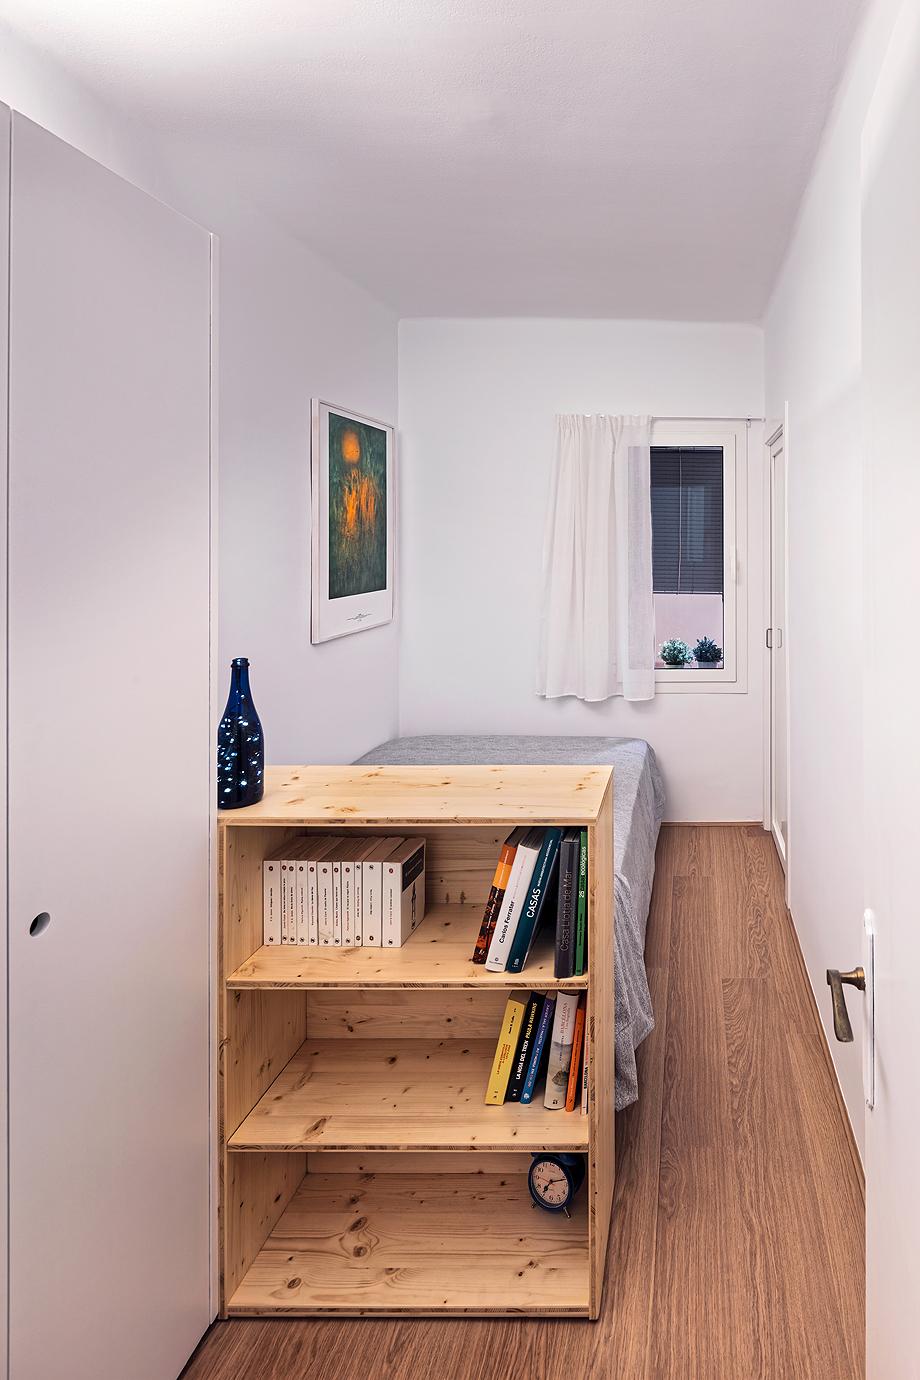 vivienda de alquiler diseño low cost agusti costa (12)